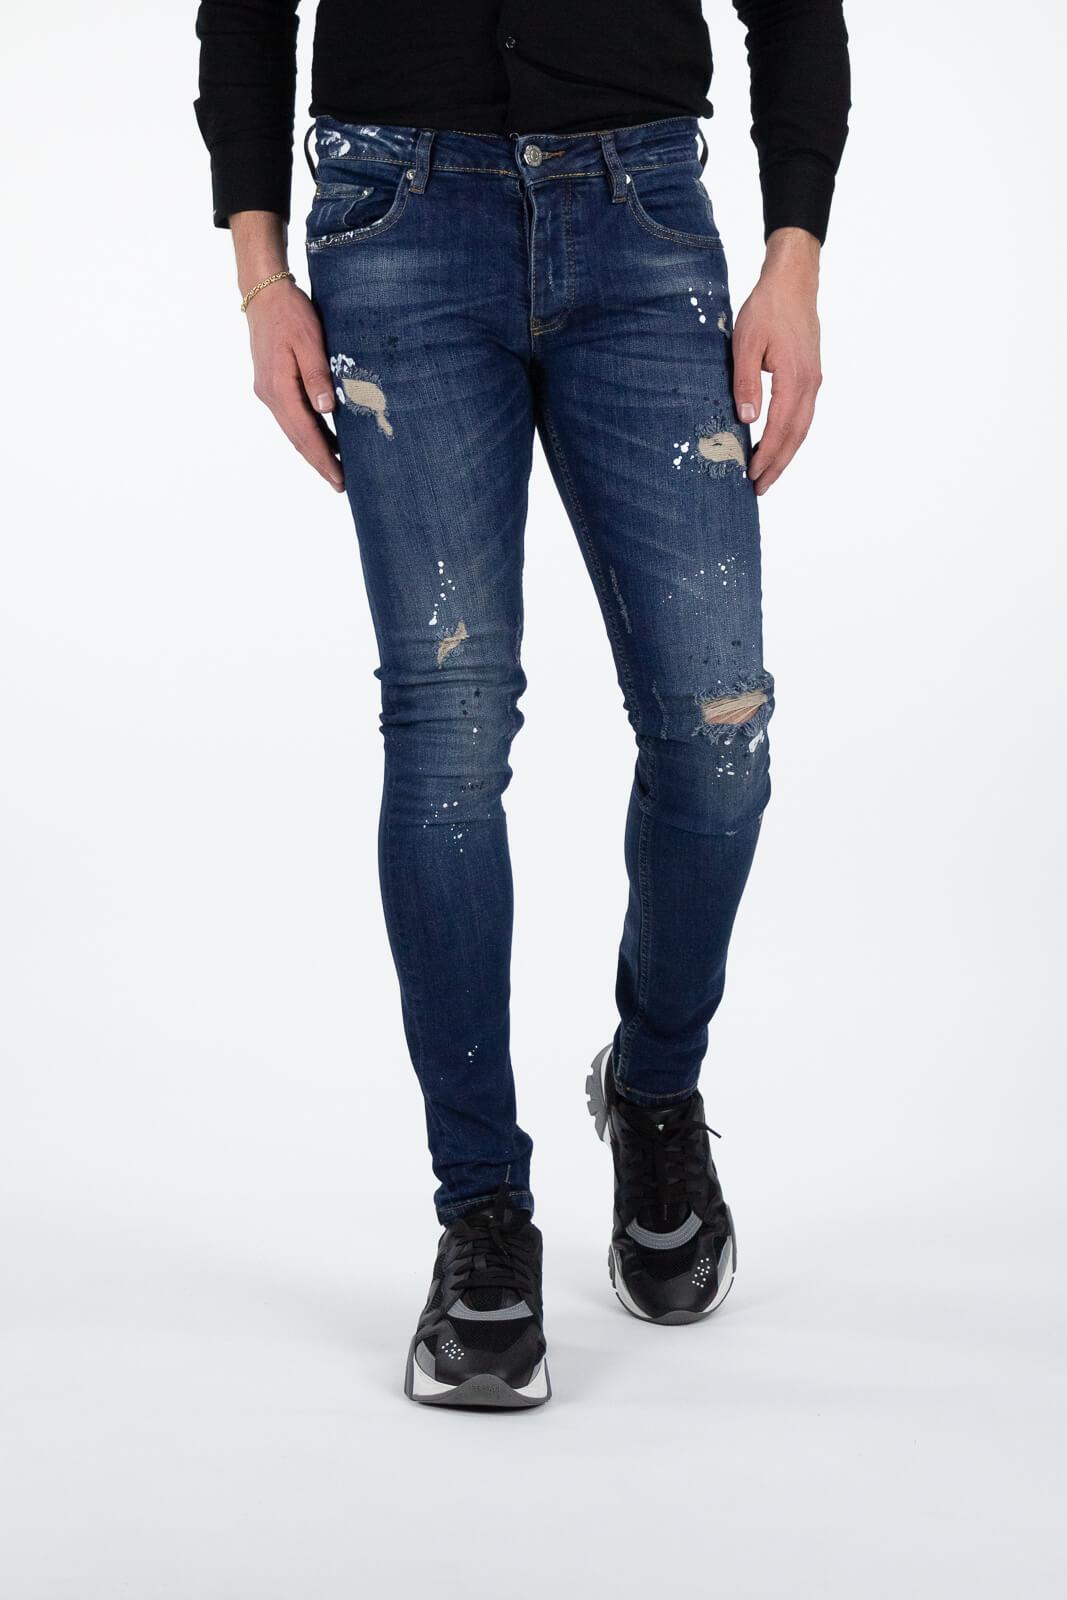 Piura Bleu Jeans-1